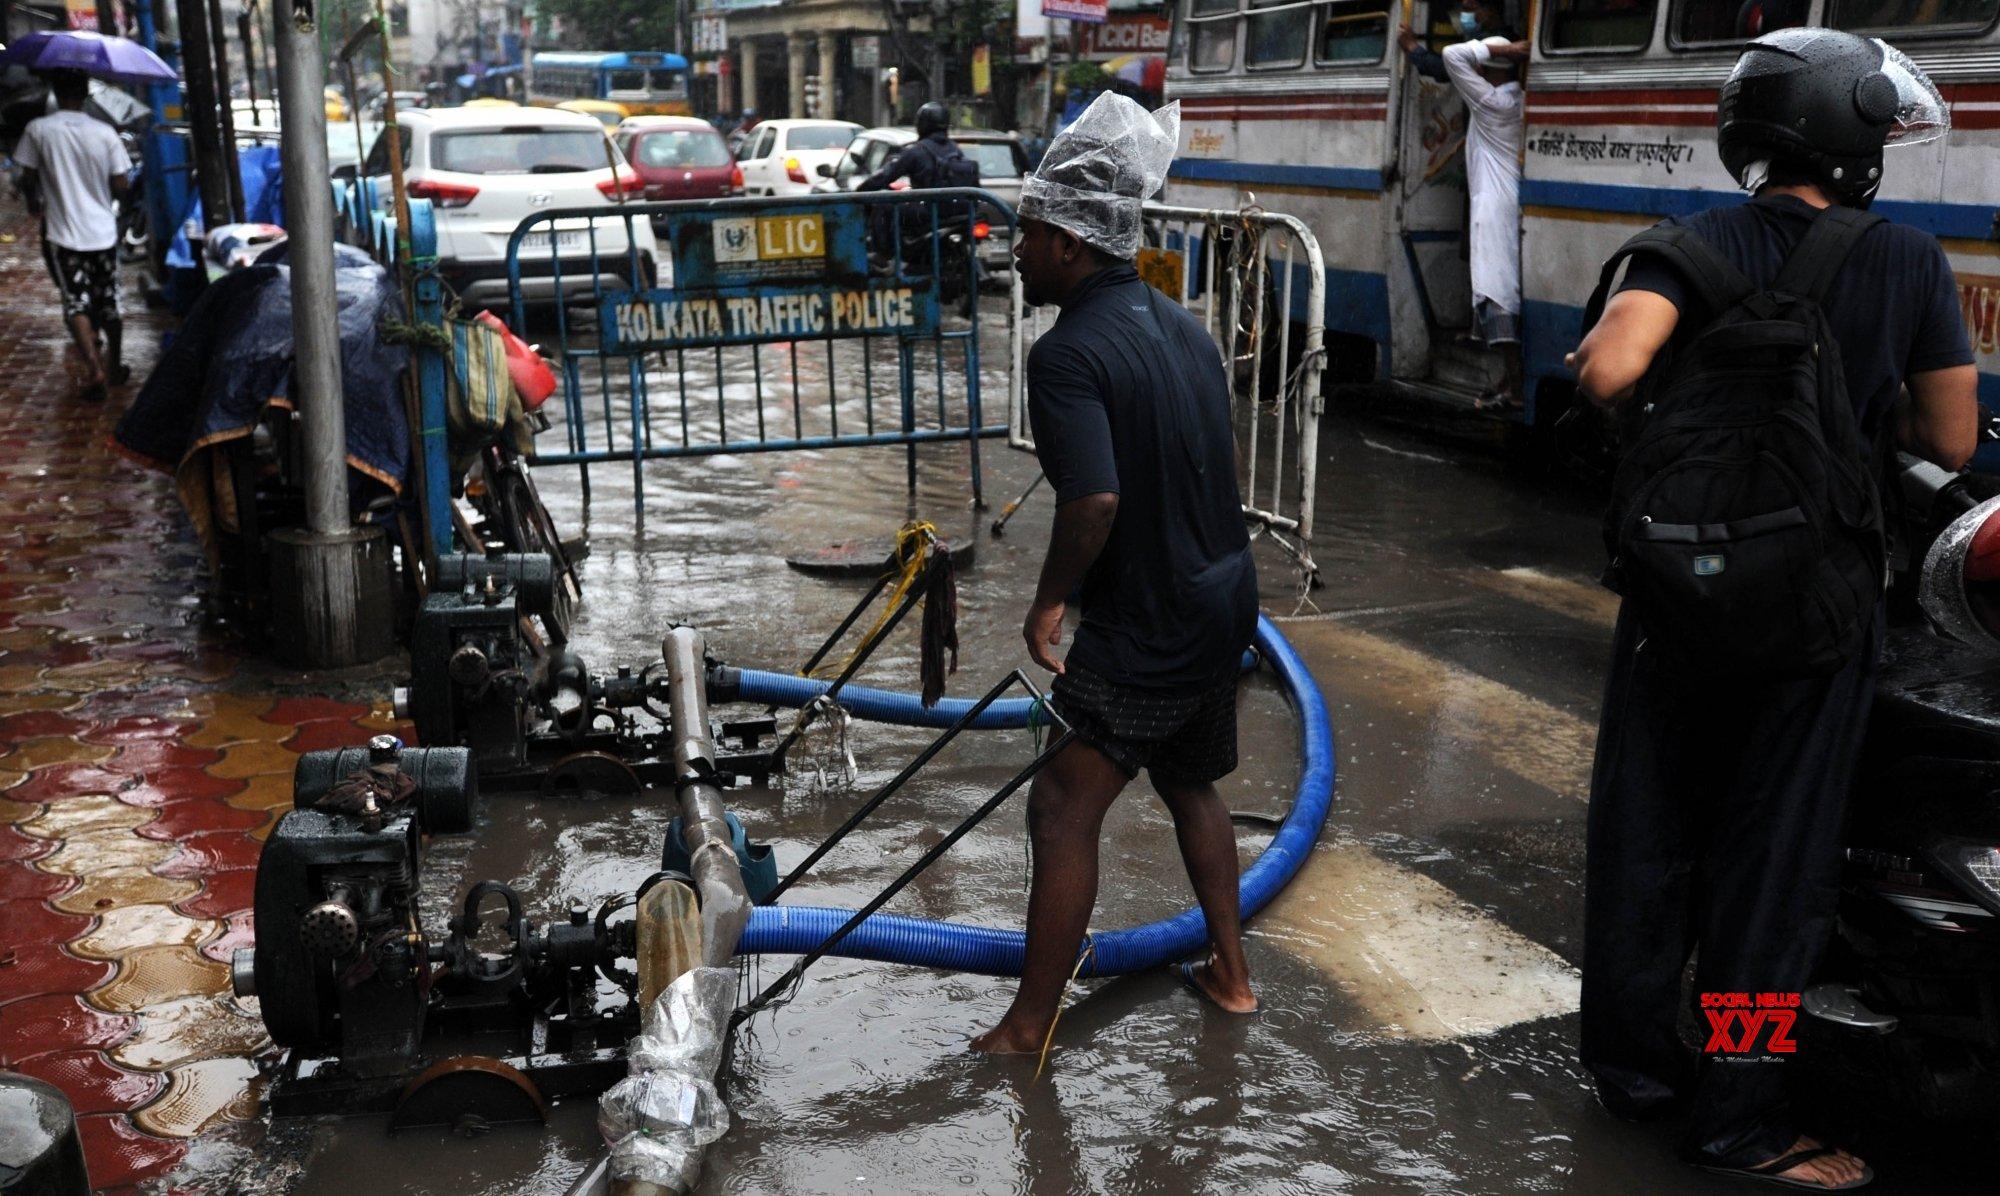 Kolkata: Commuters wade through waterlogged street after heavy rains lash city in Kolkata. #Gallery